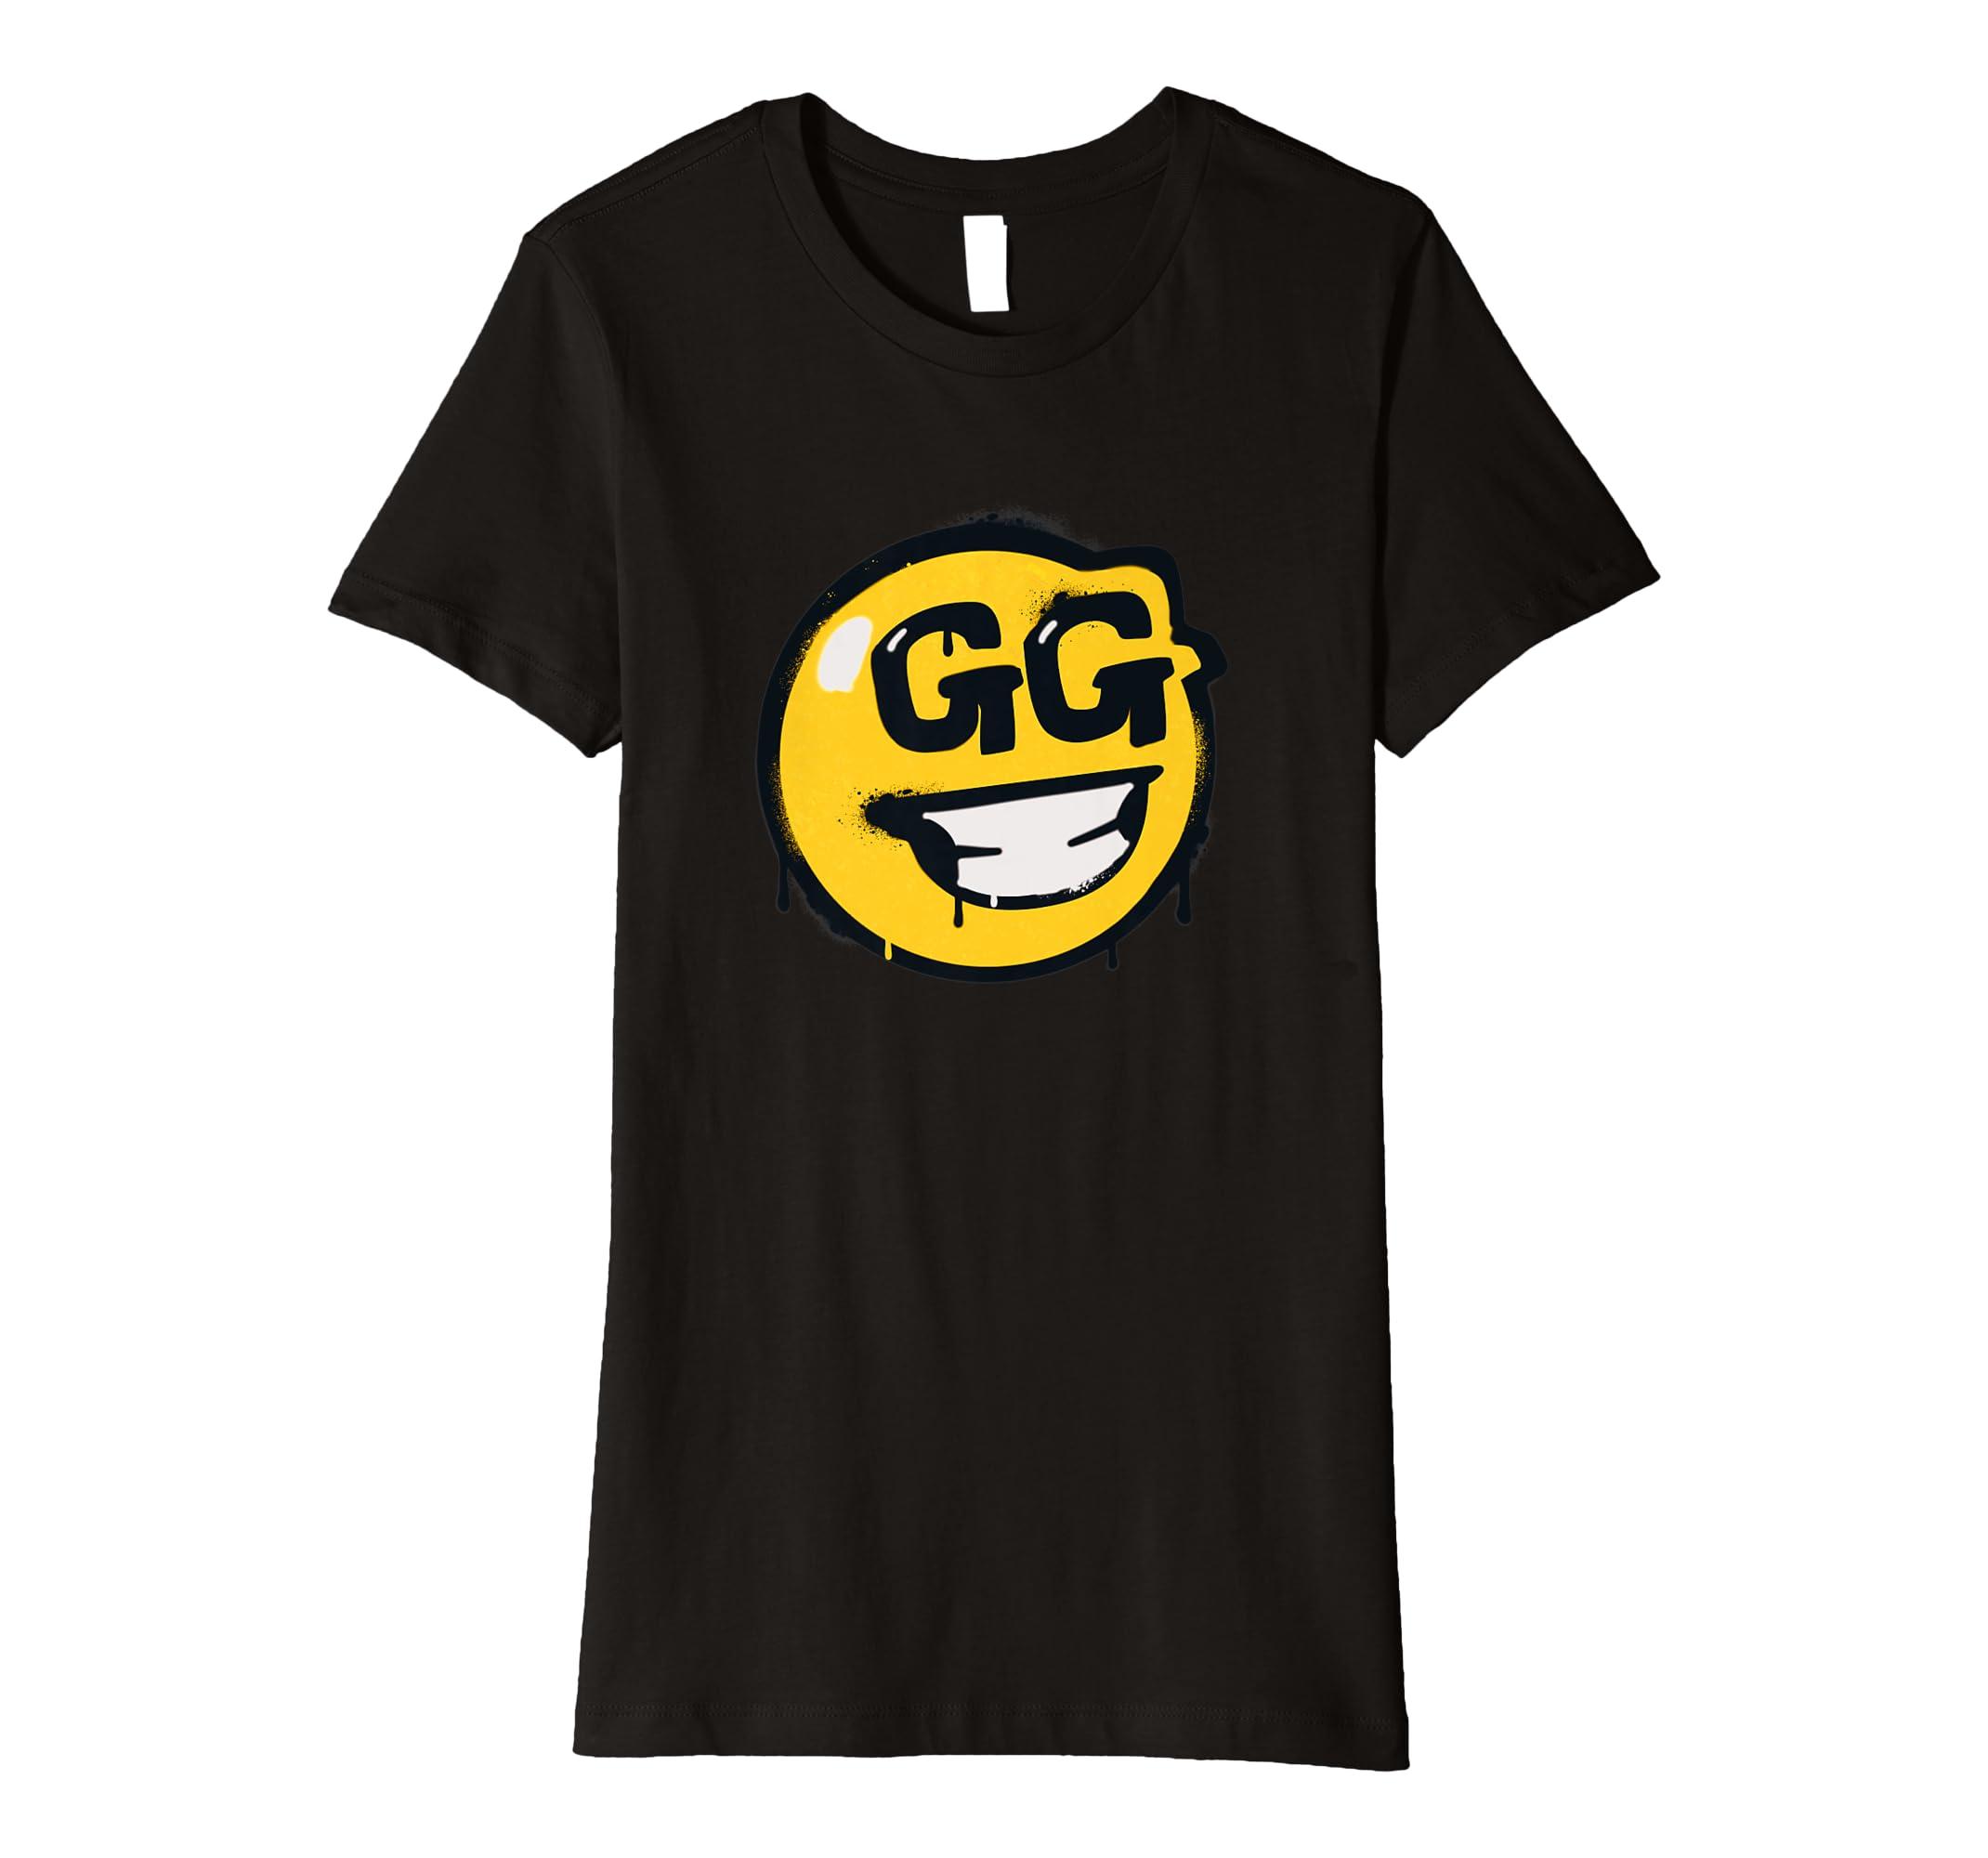 Fortnite Gg T Shirt by Fortnite